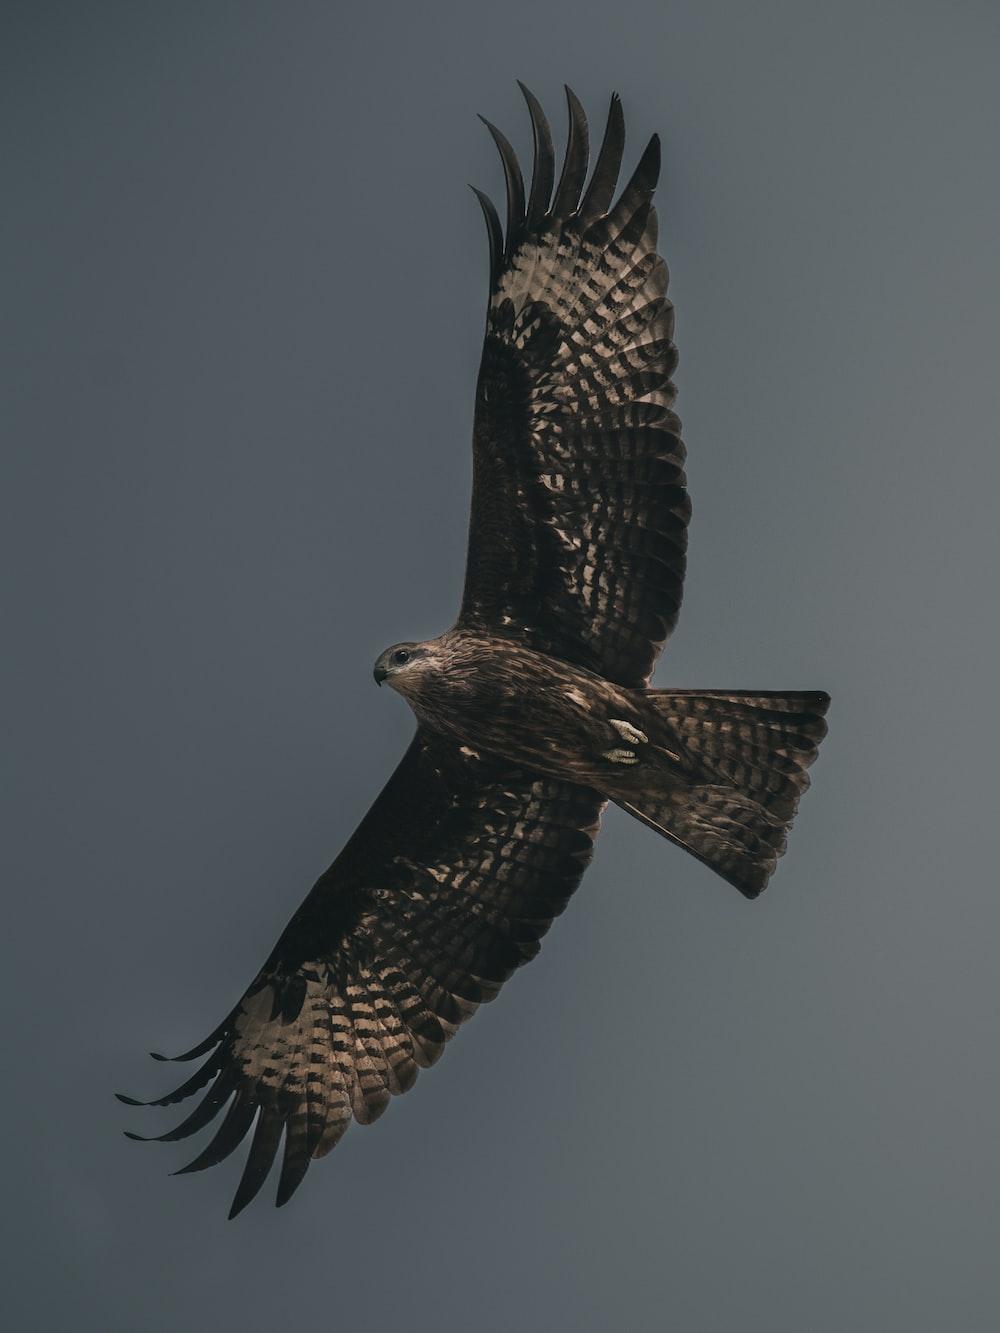 white and black American bald eagle midair